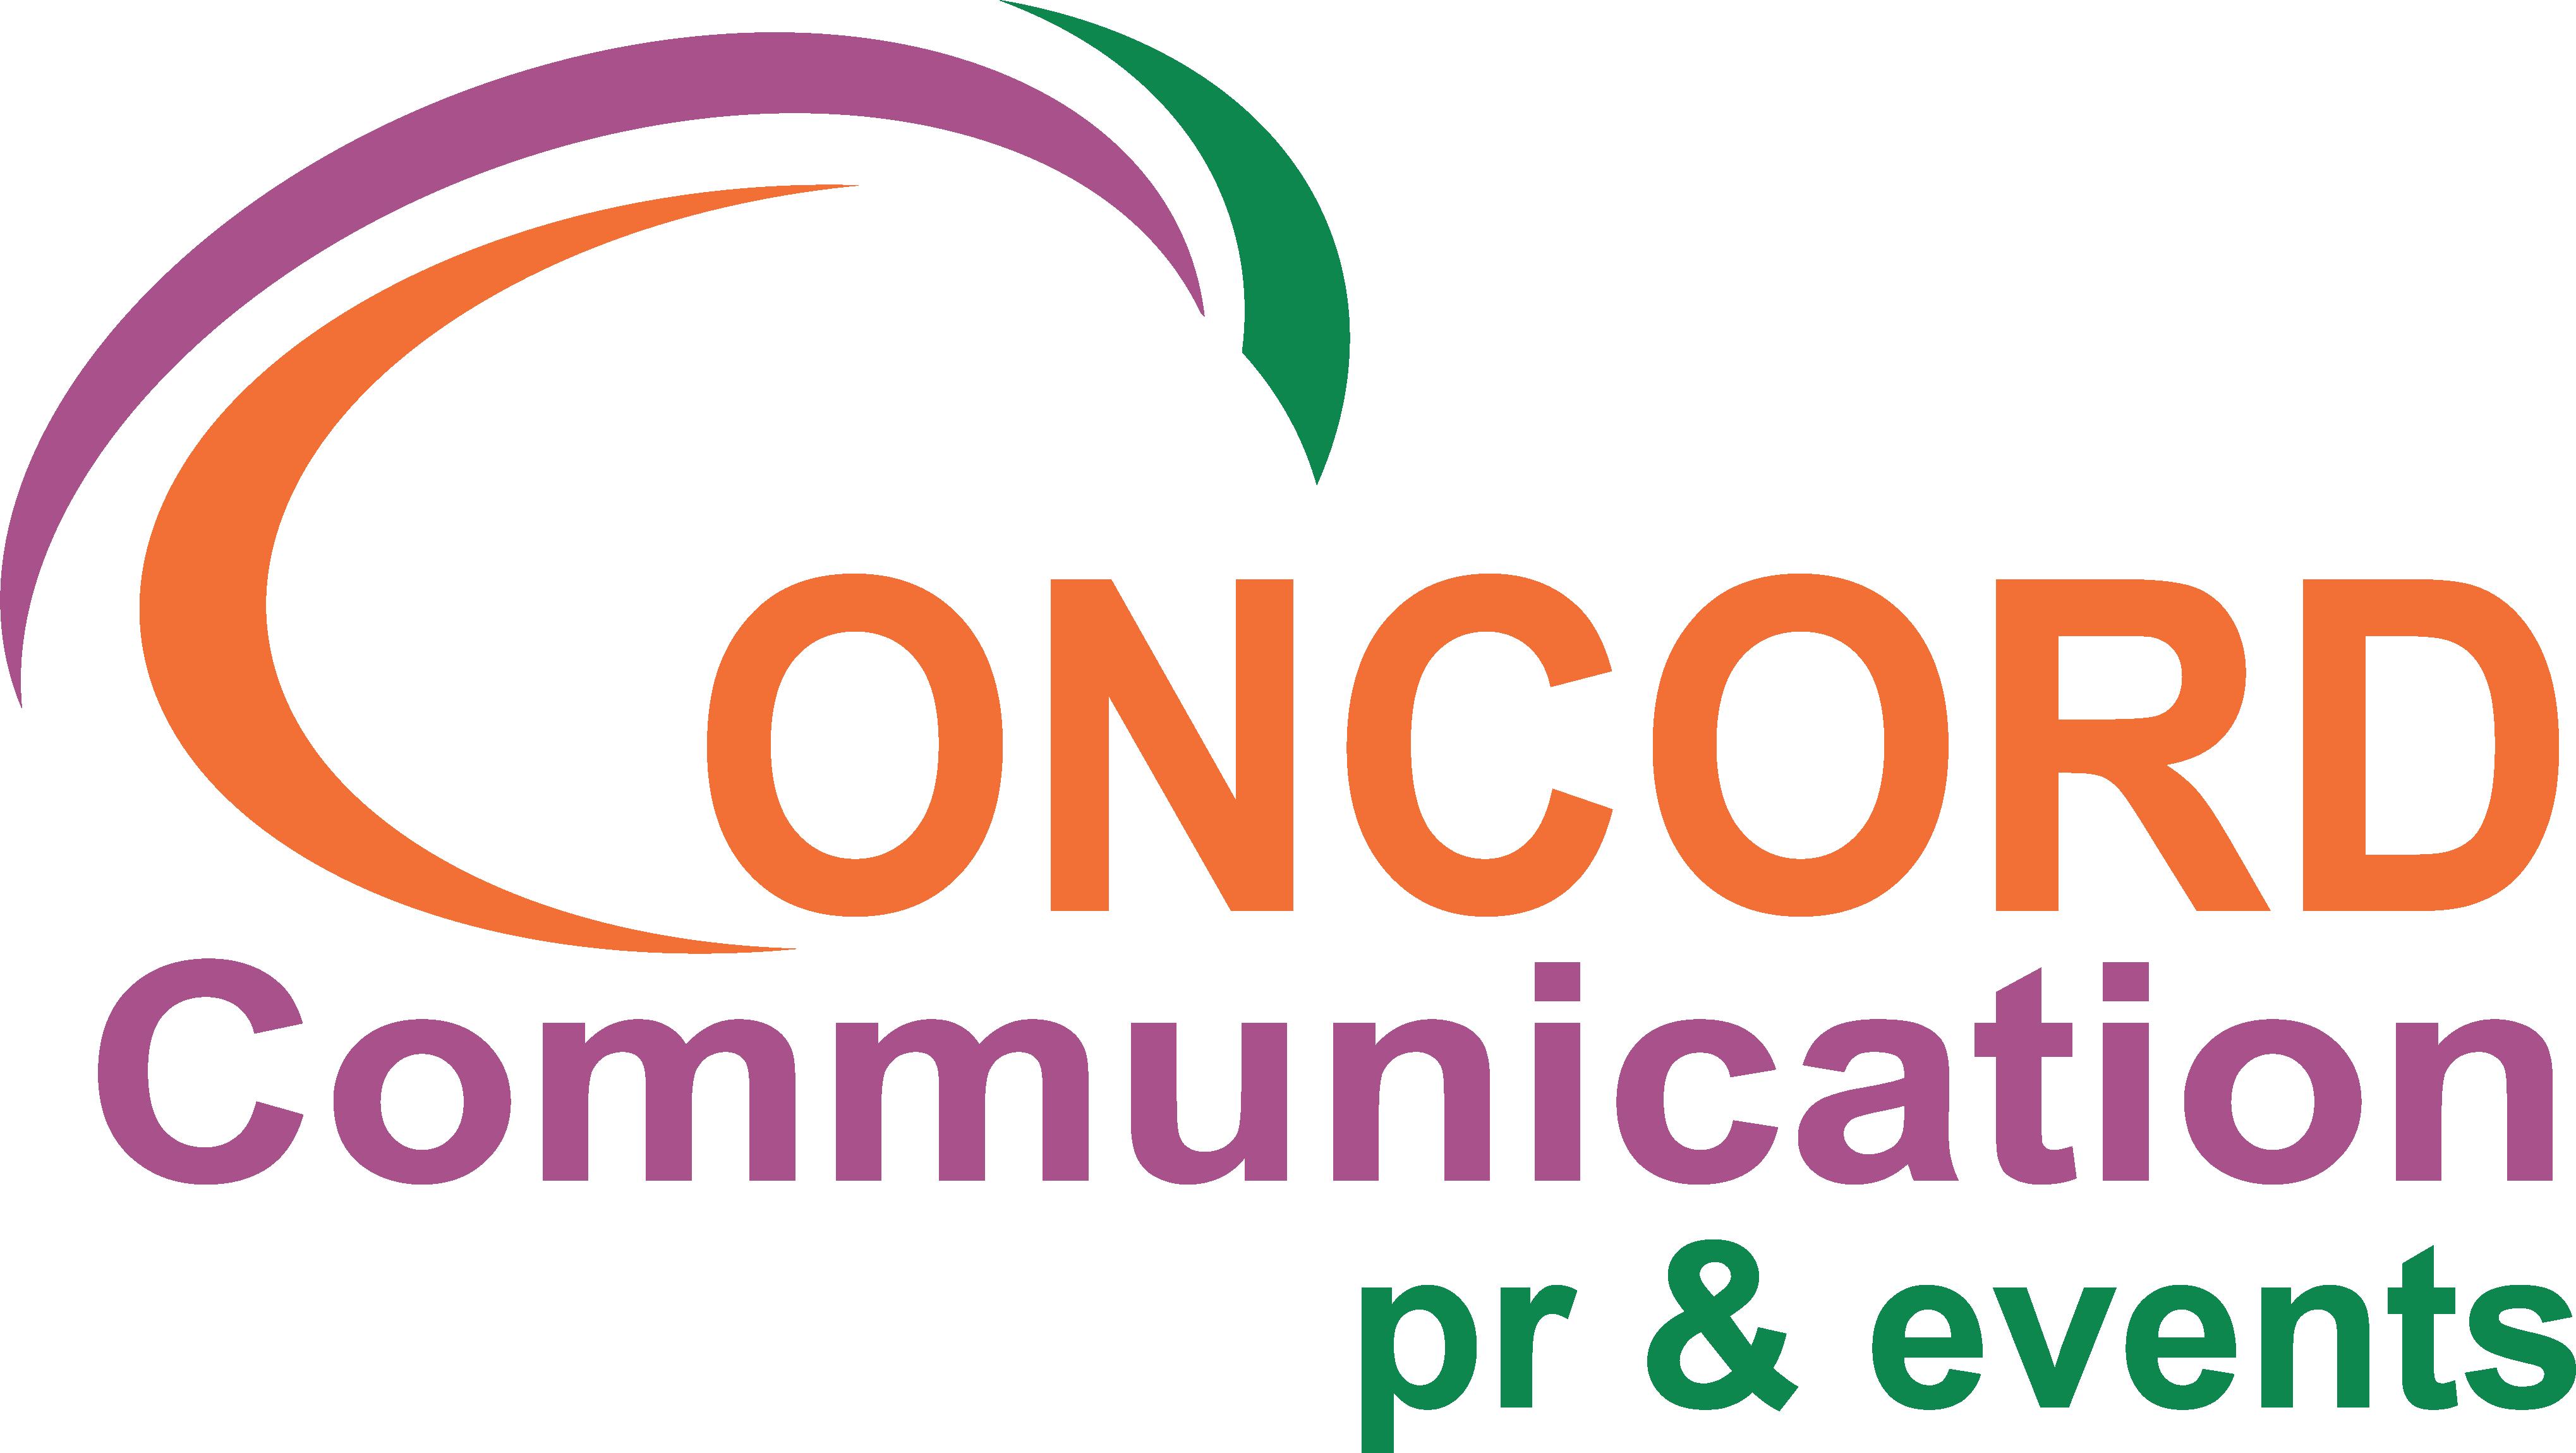 Concord Communication SRL